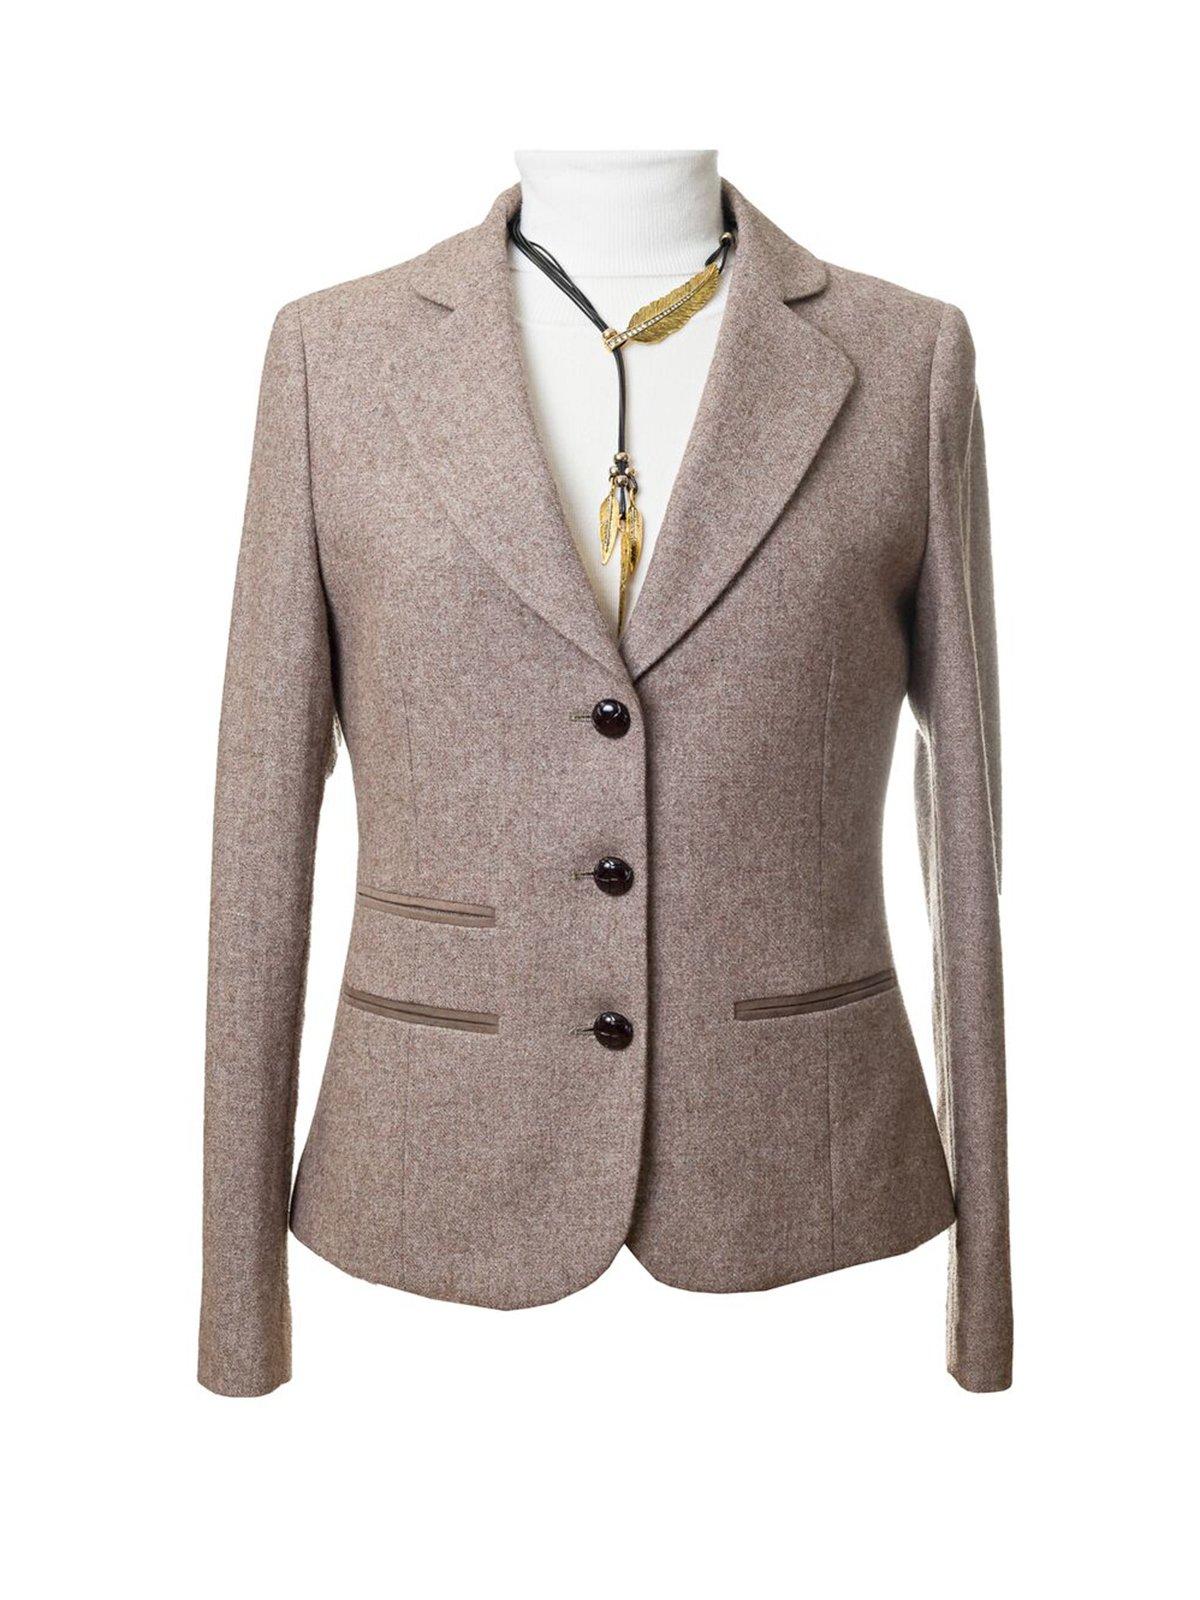 Tweed Blazers and Skirts